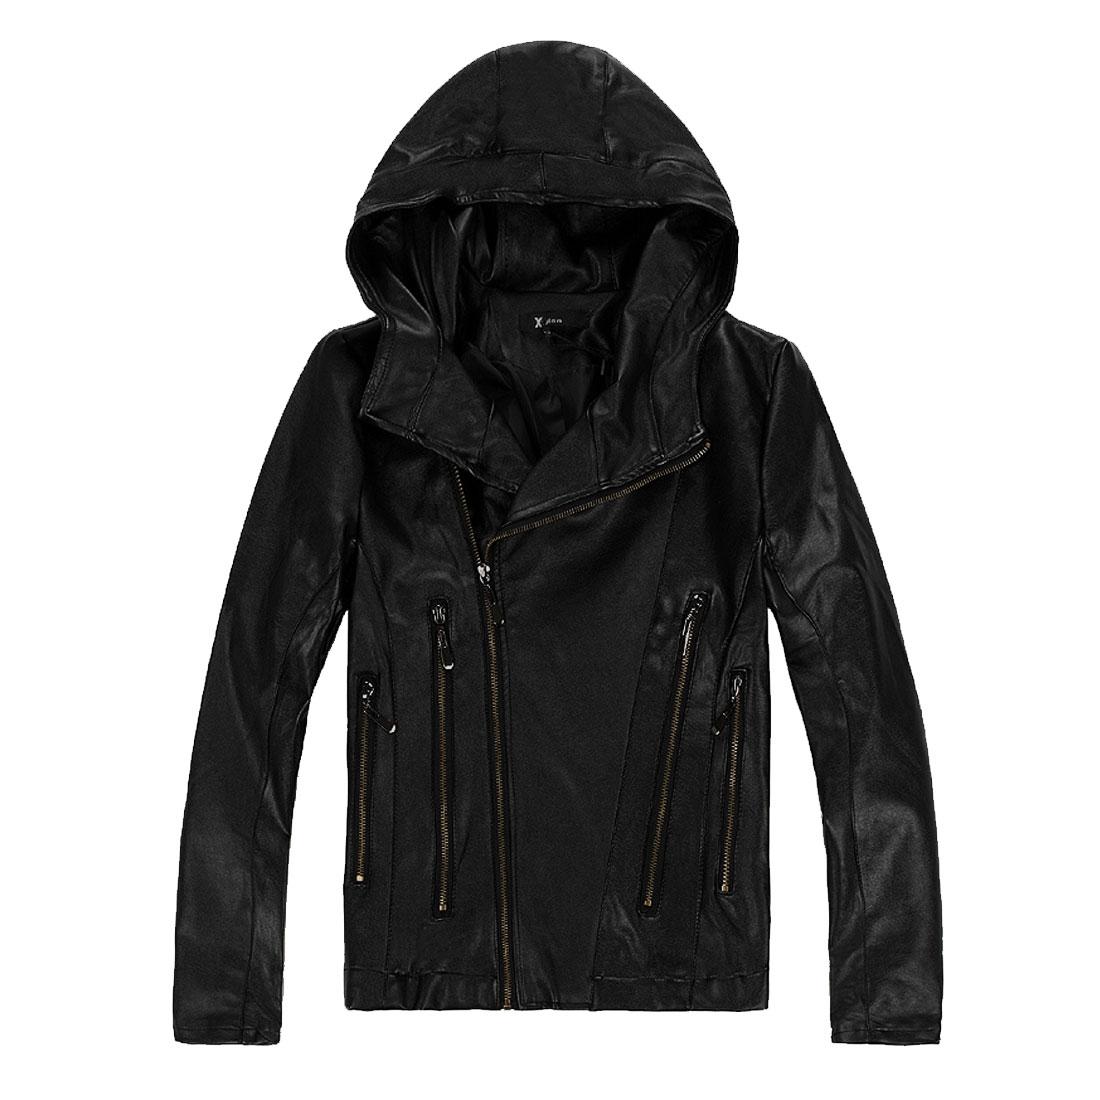 Mens New Fashion Black Long Sleeve Zippered Biker Jacket S